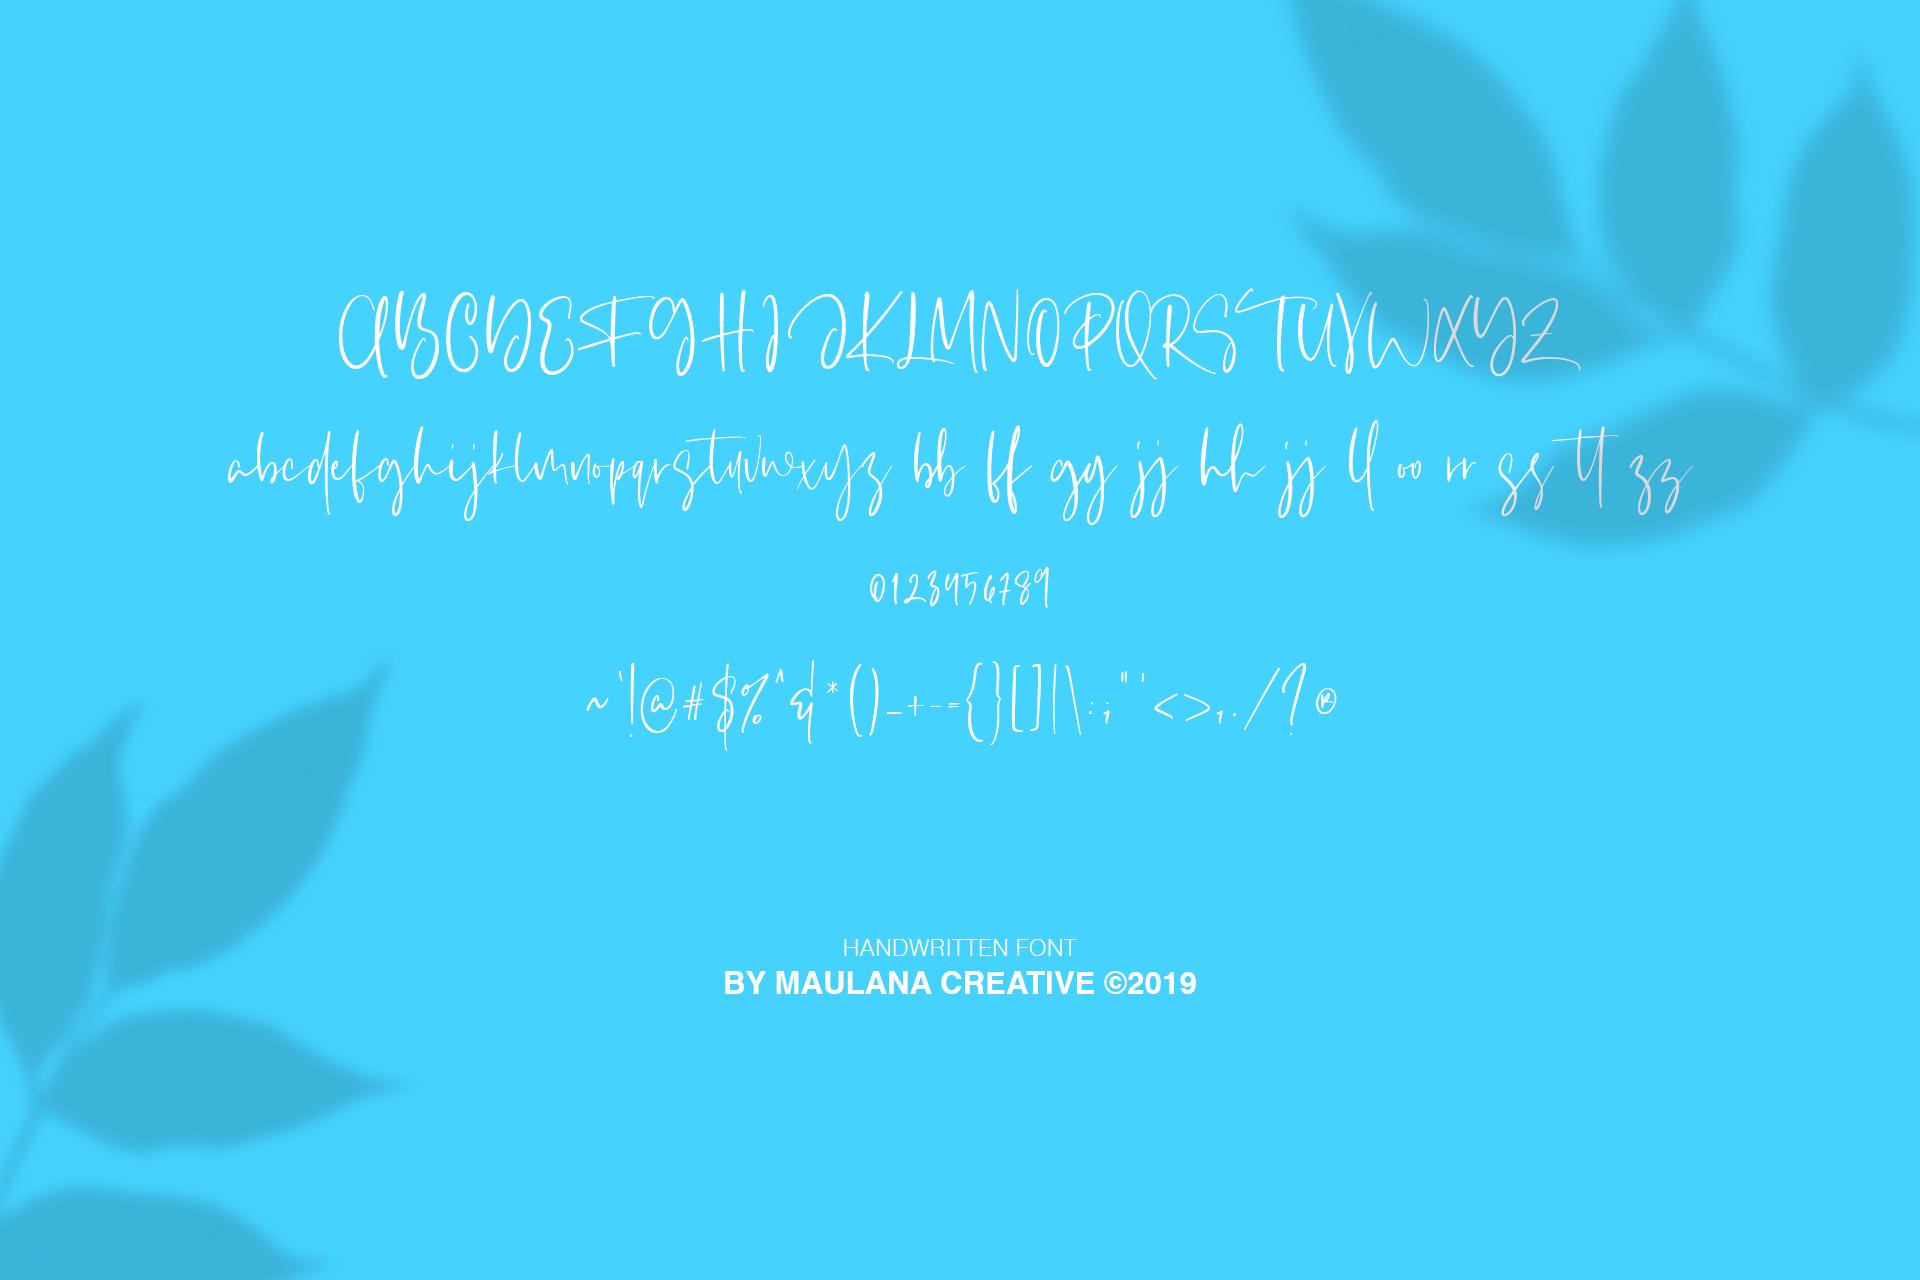 Sourbites Handwritten Font example image 9